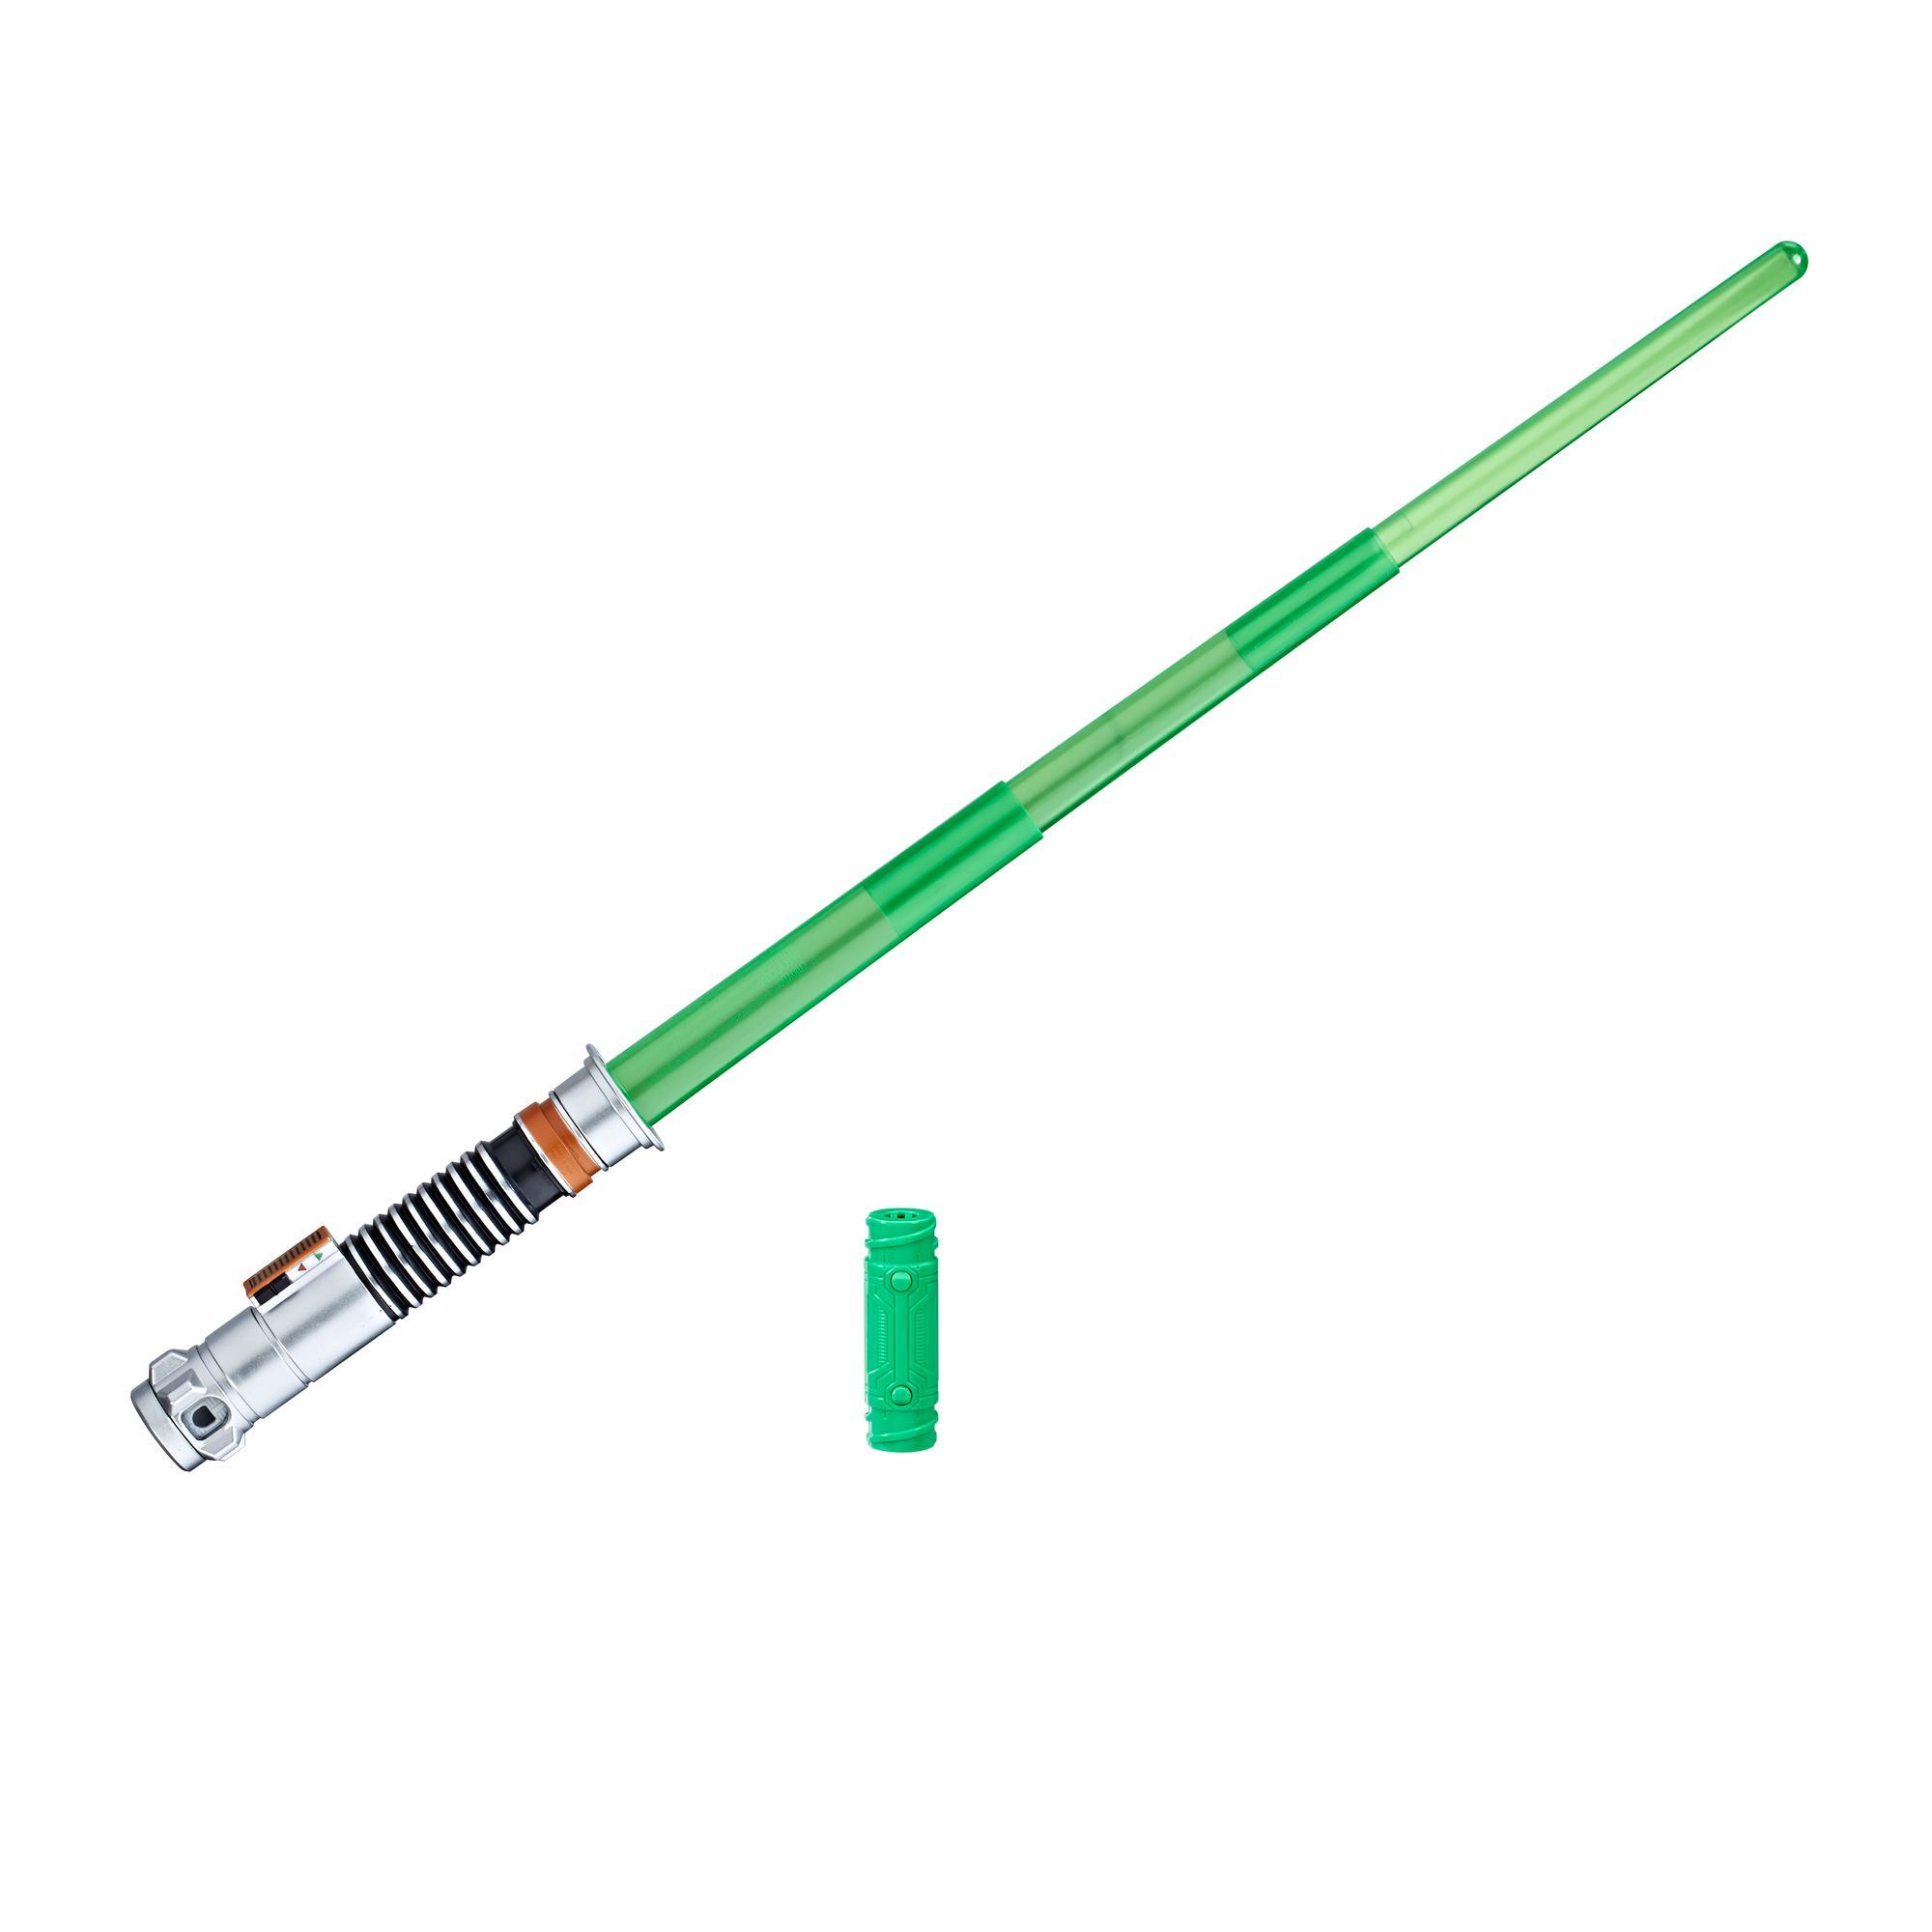 Star Wars: Return of the Jedi Luke Skywalker Electronic Lightsaber